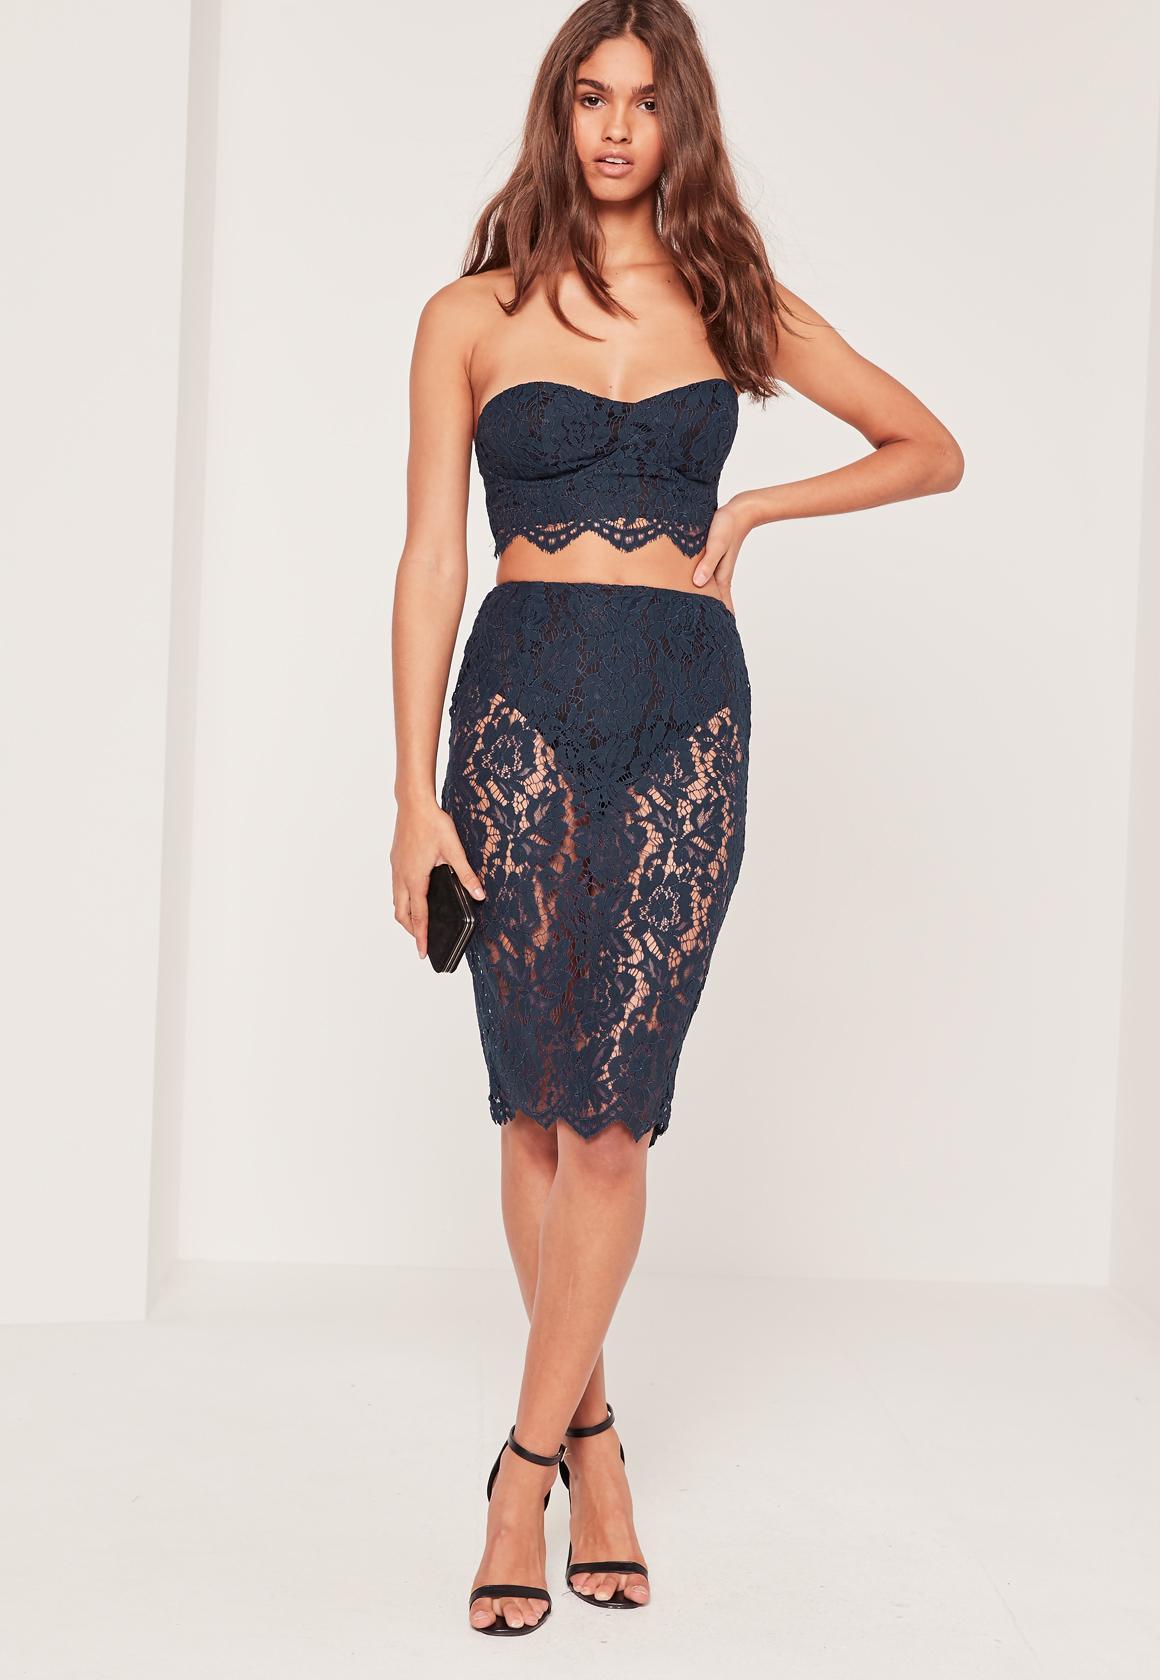 Lace Knicker Insert Midi Skirt Blue | Missguided